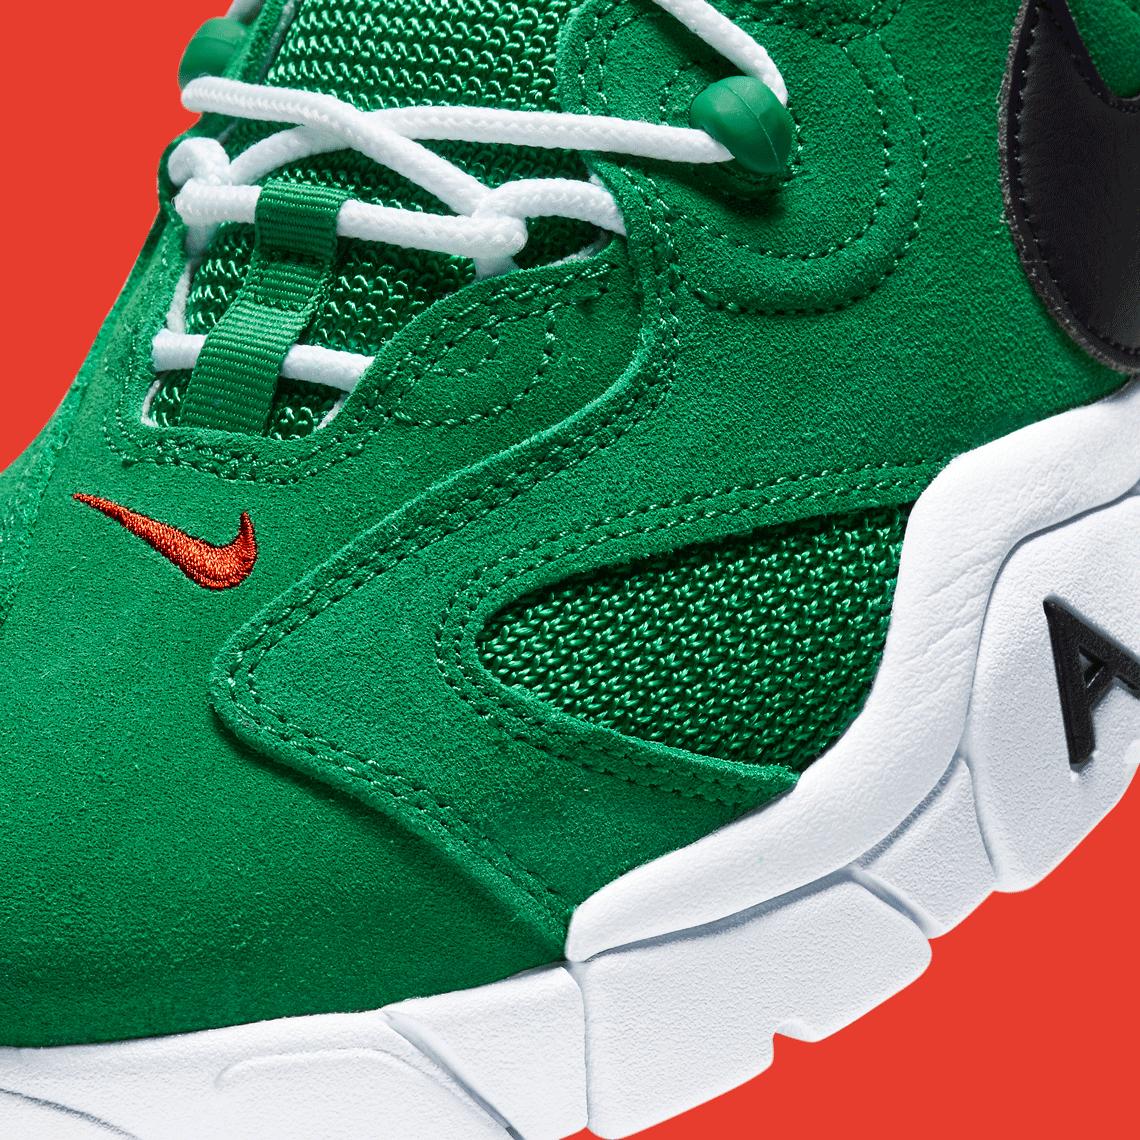 Peregrinación capacidad Won  Nike Air Barrage Low Heineken CT2290-300 Release   SneakerNews.com